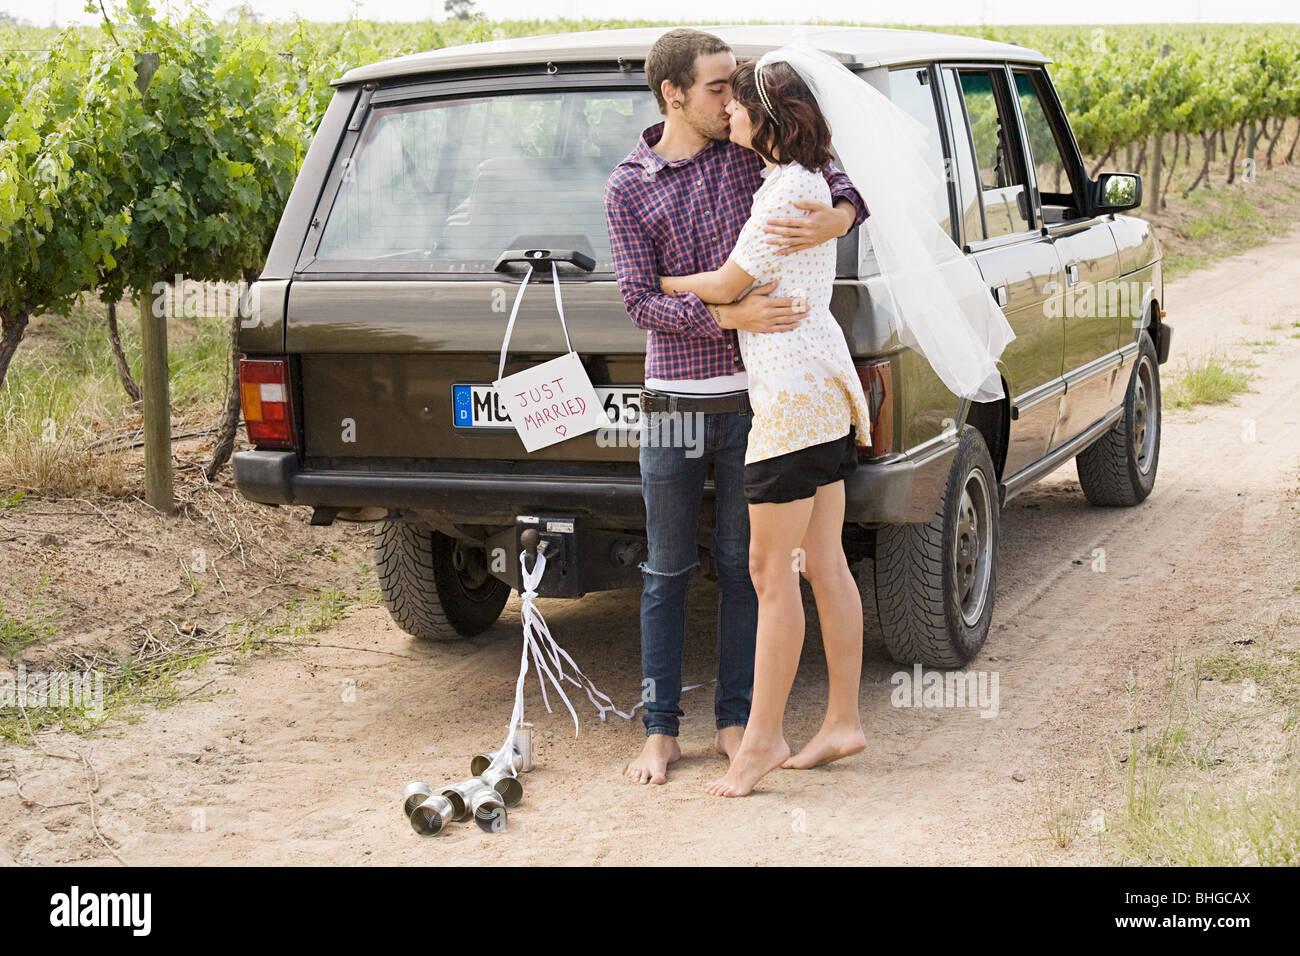 Newlywed couple kissing by vehicle - Stock Image